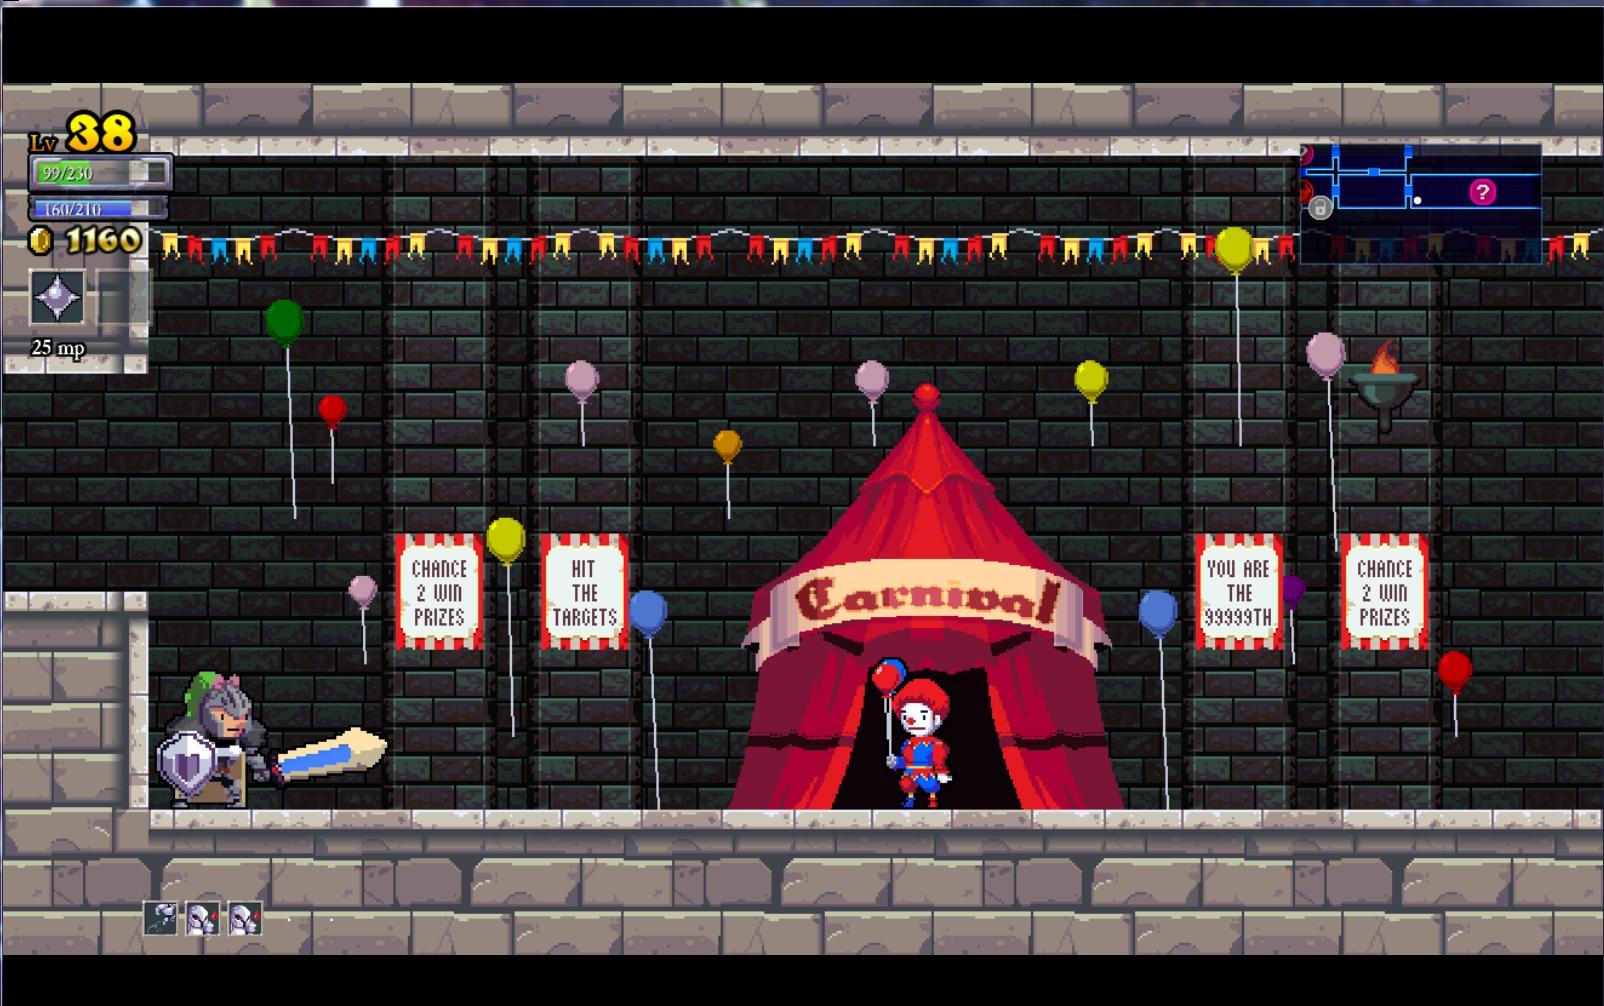 Rl clown tent.jpg & Image - Rl clown tent.jpg | Rogue Legacy Wiki | FANDOM powered by ...